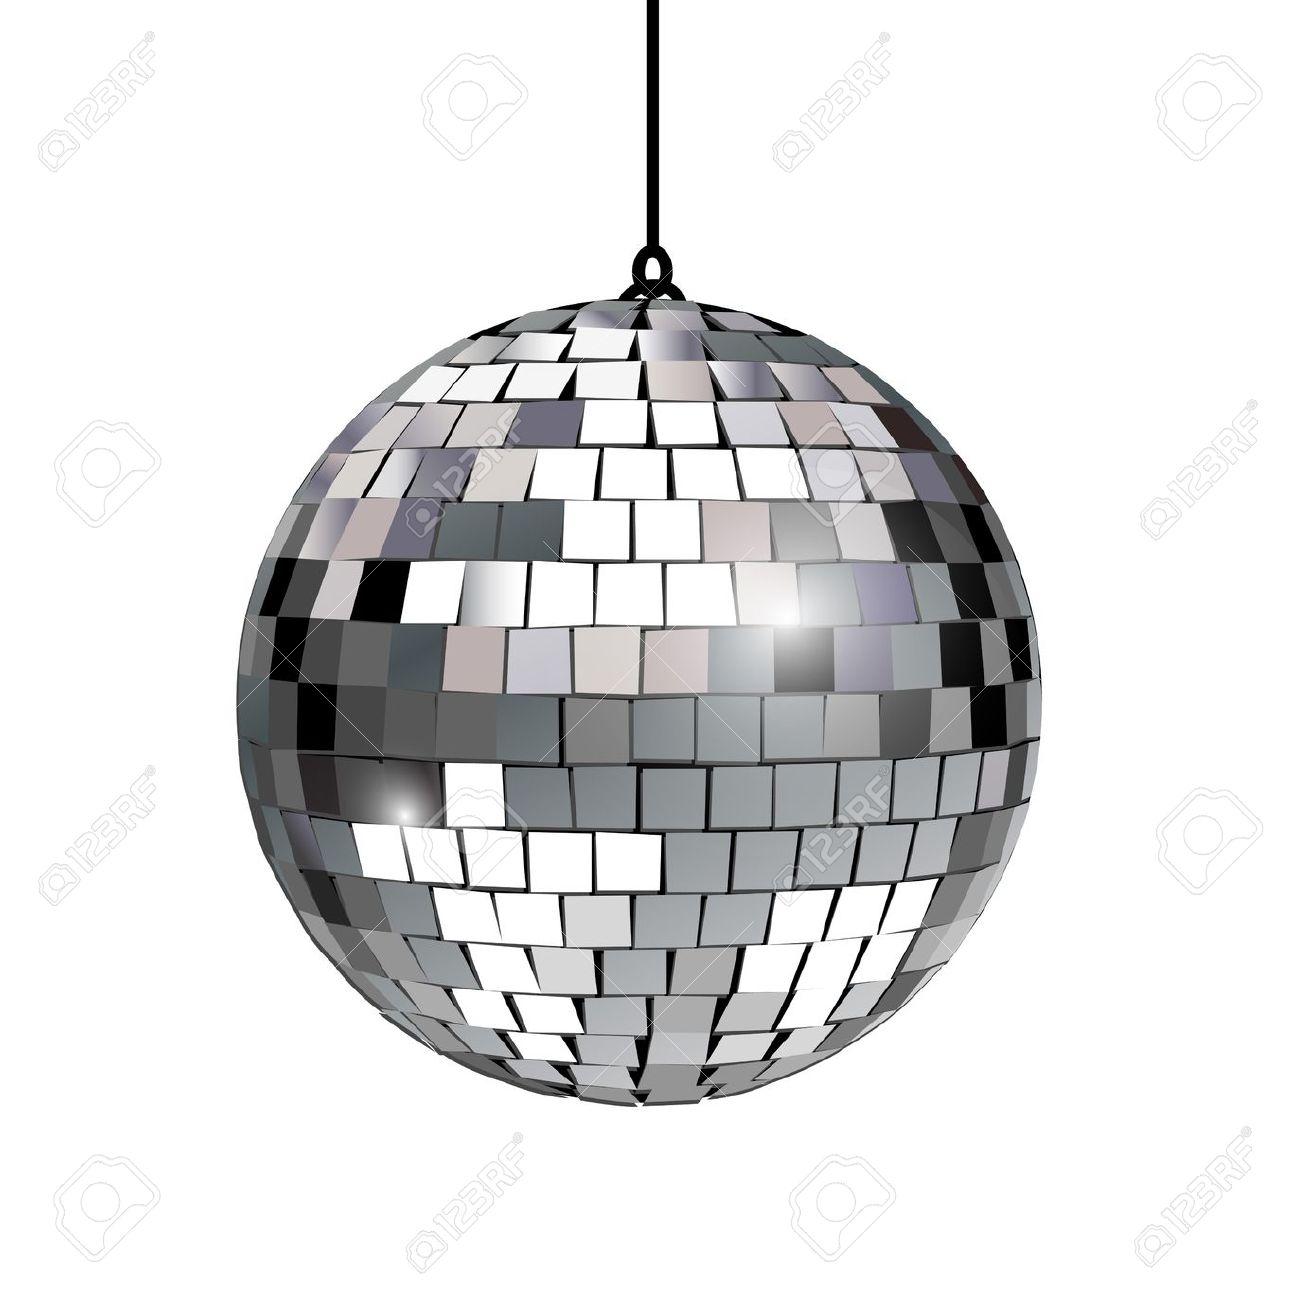 Disco Ball Clip Art. disco ba - Disco Ball Clip Art